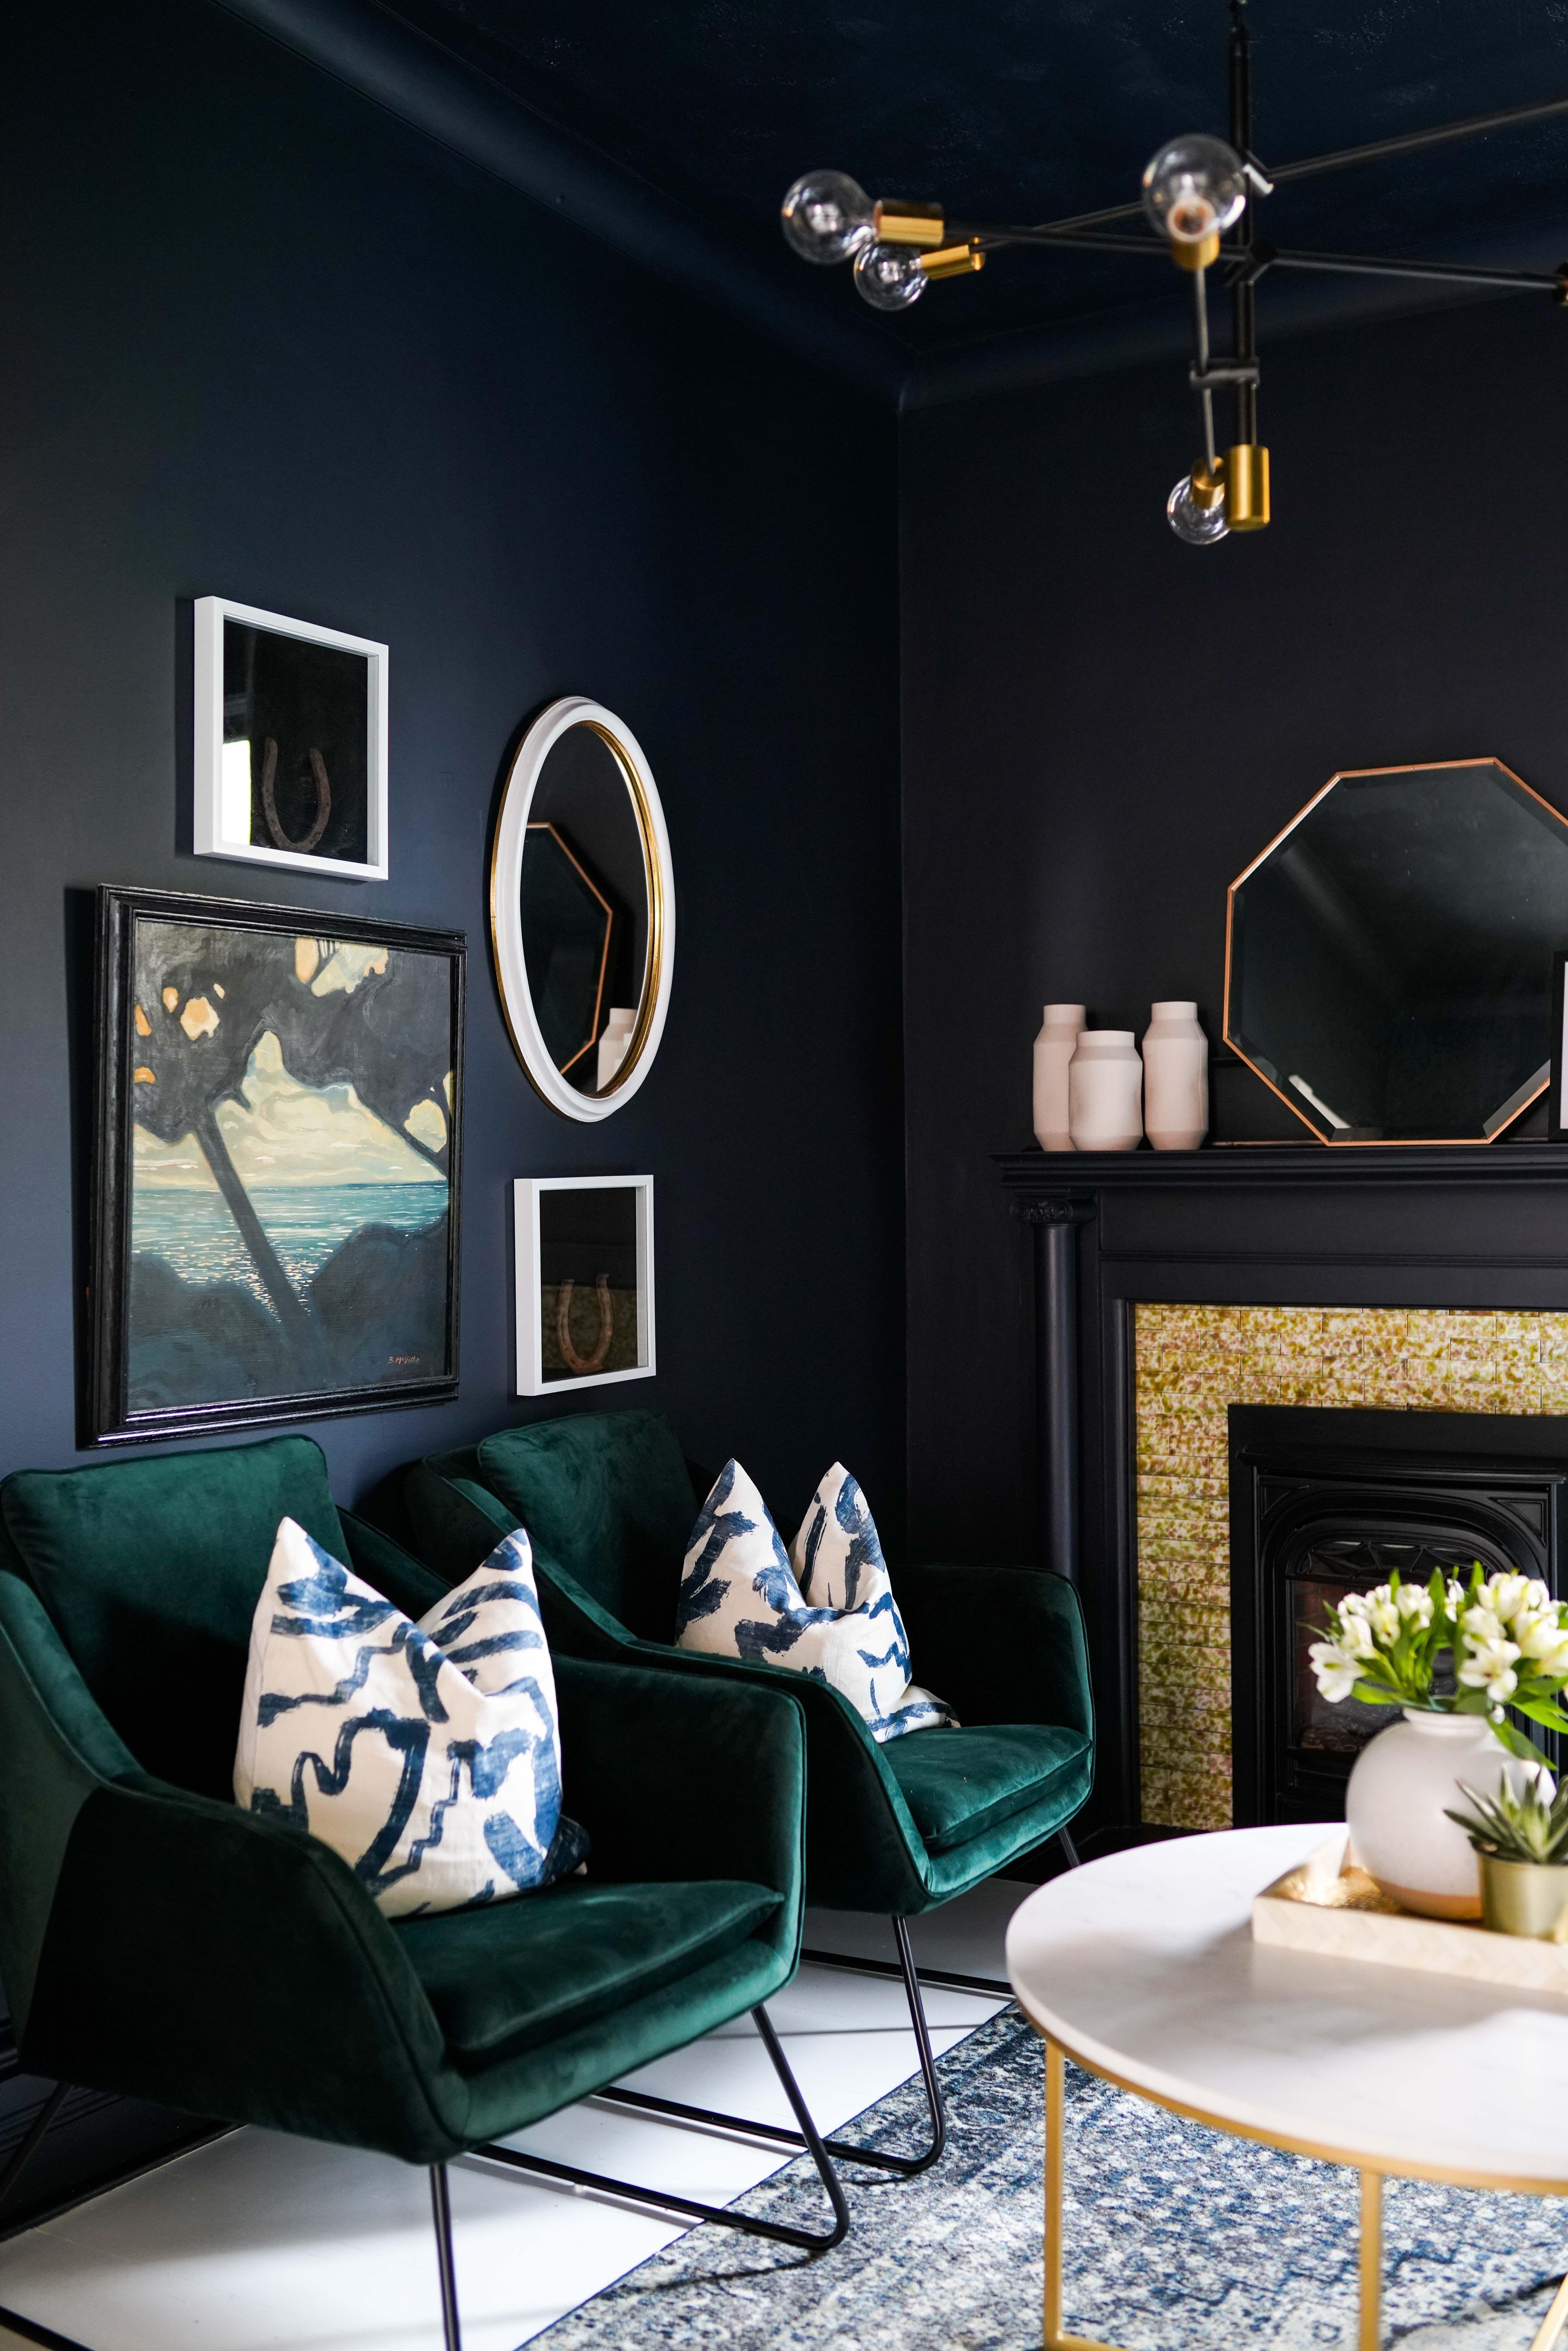 21 Pretty Home Interior Design Green That Will Replenish Your